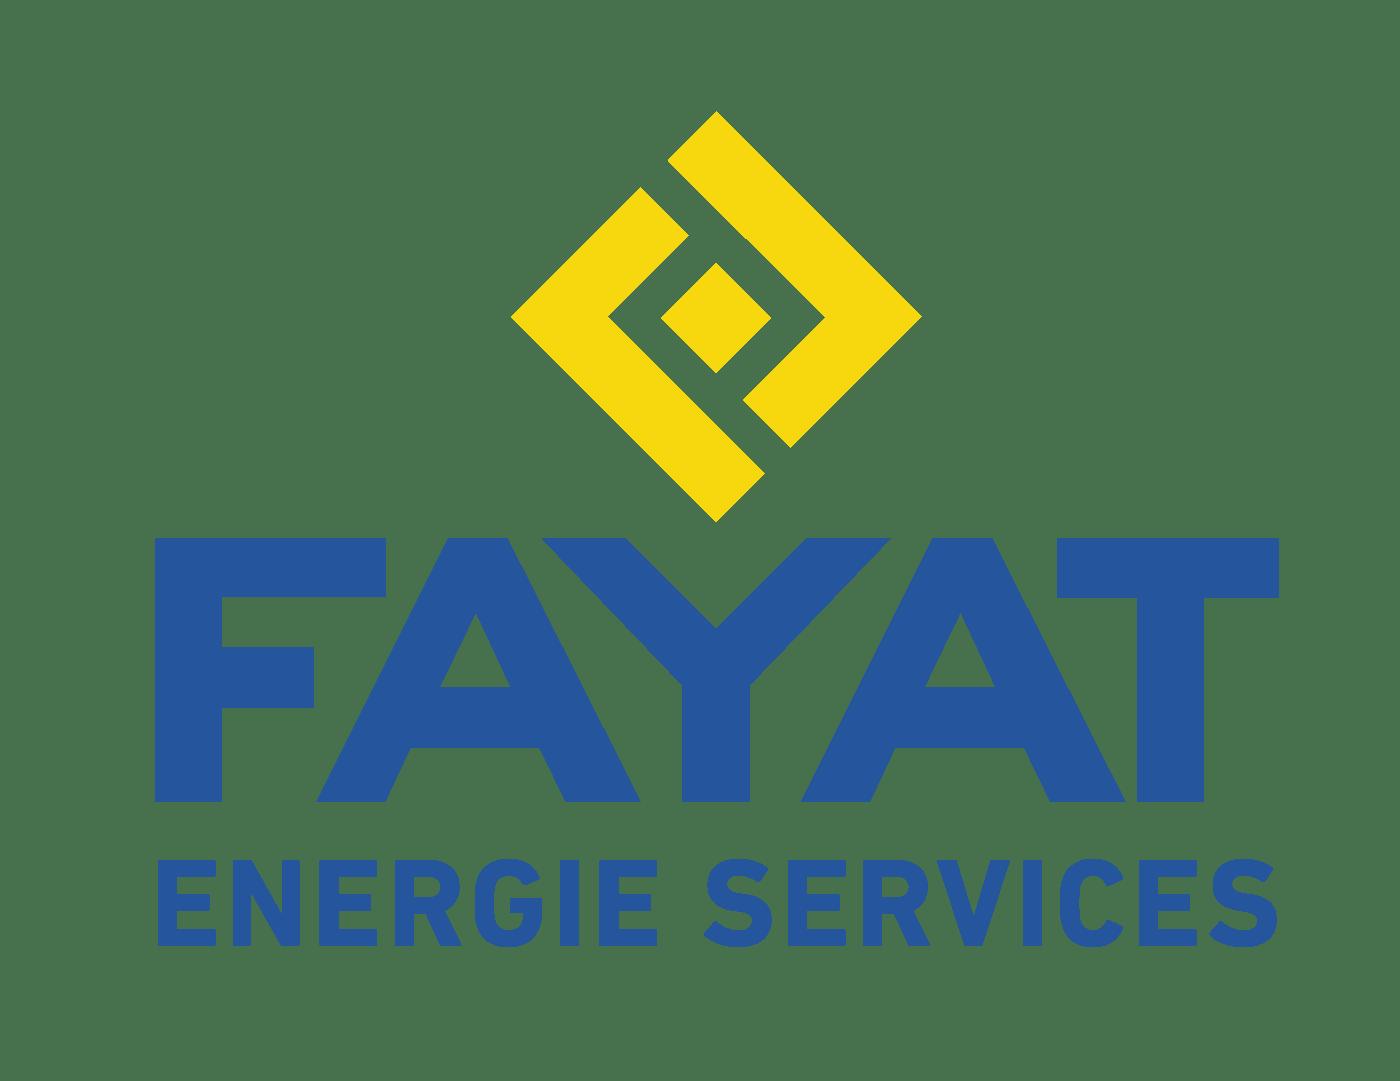 Fayat Energies Services